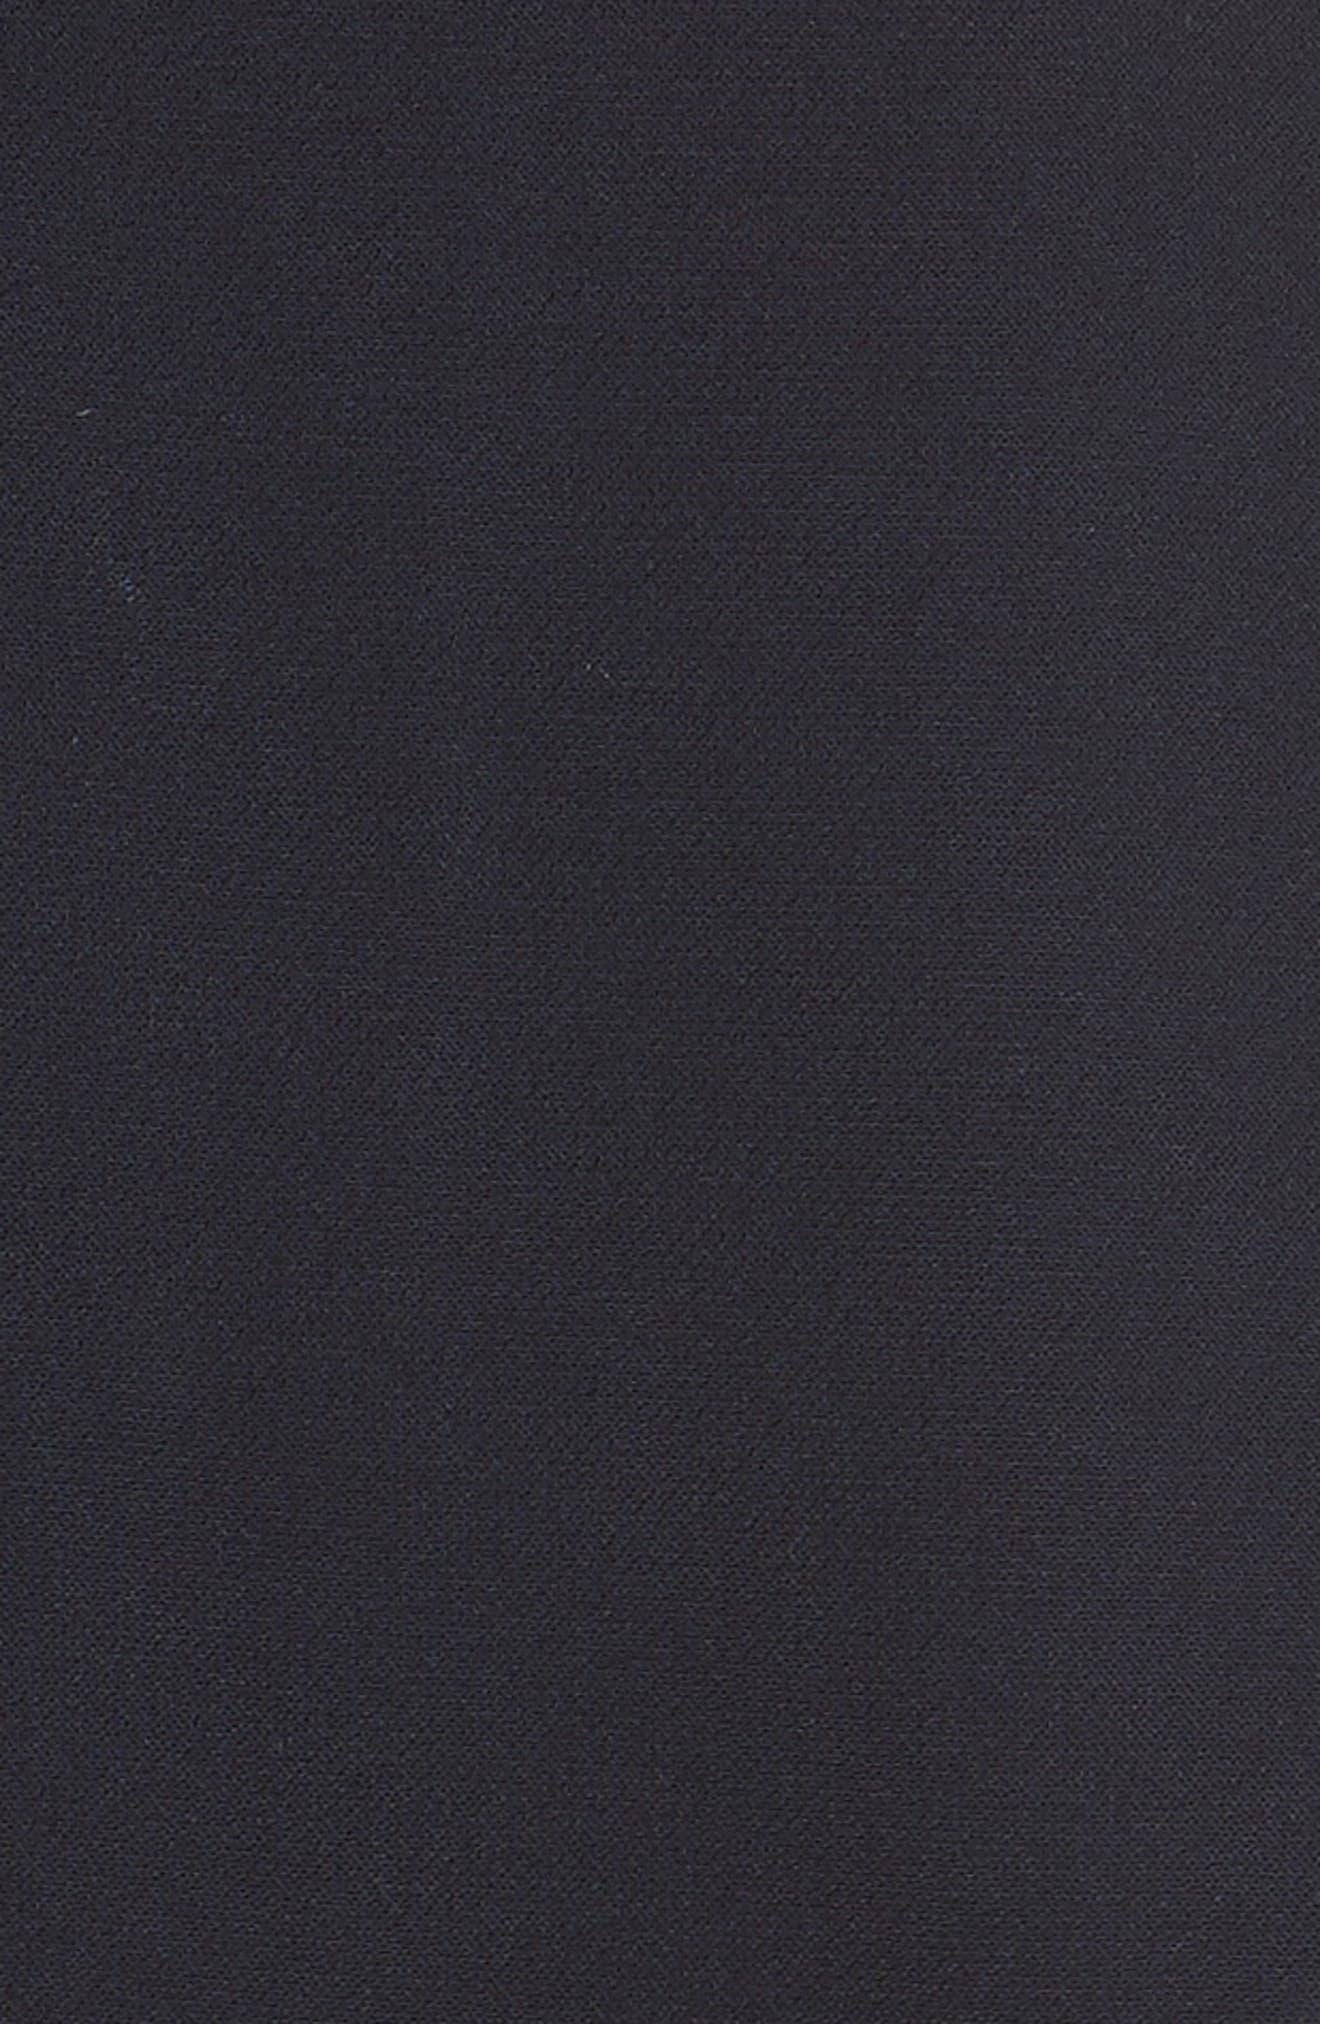 Alternate Image 5  - Ted Baker London Scalloped Panel Fit & Flare Dress